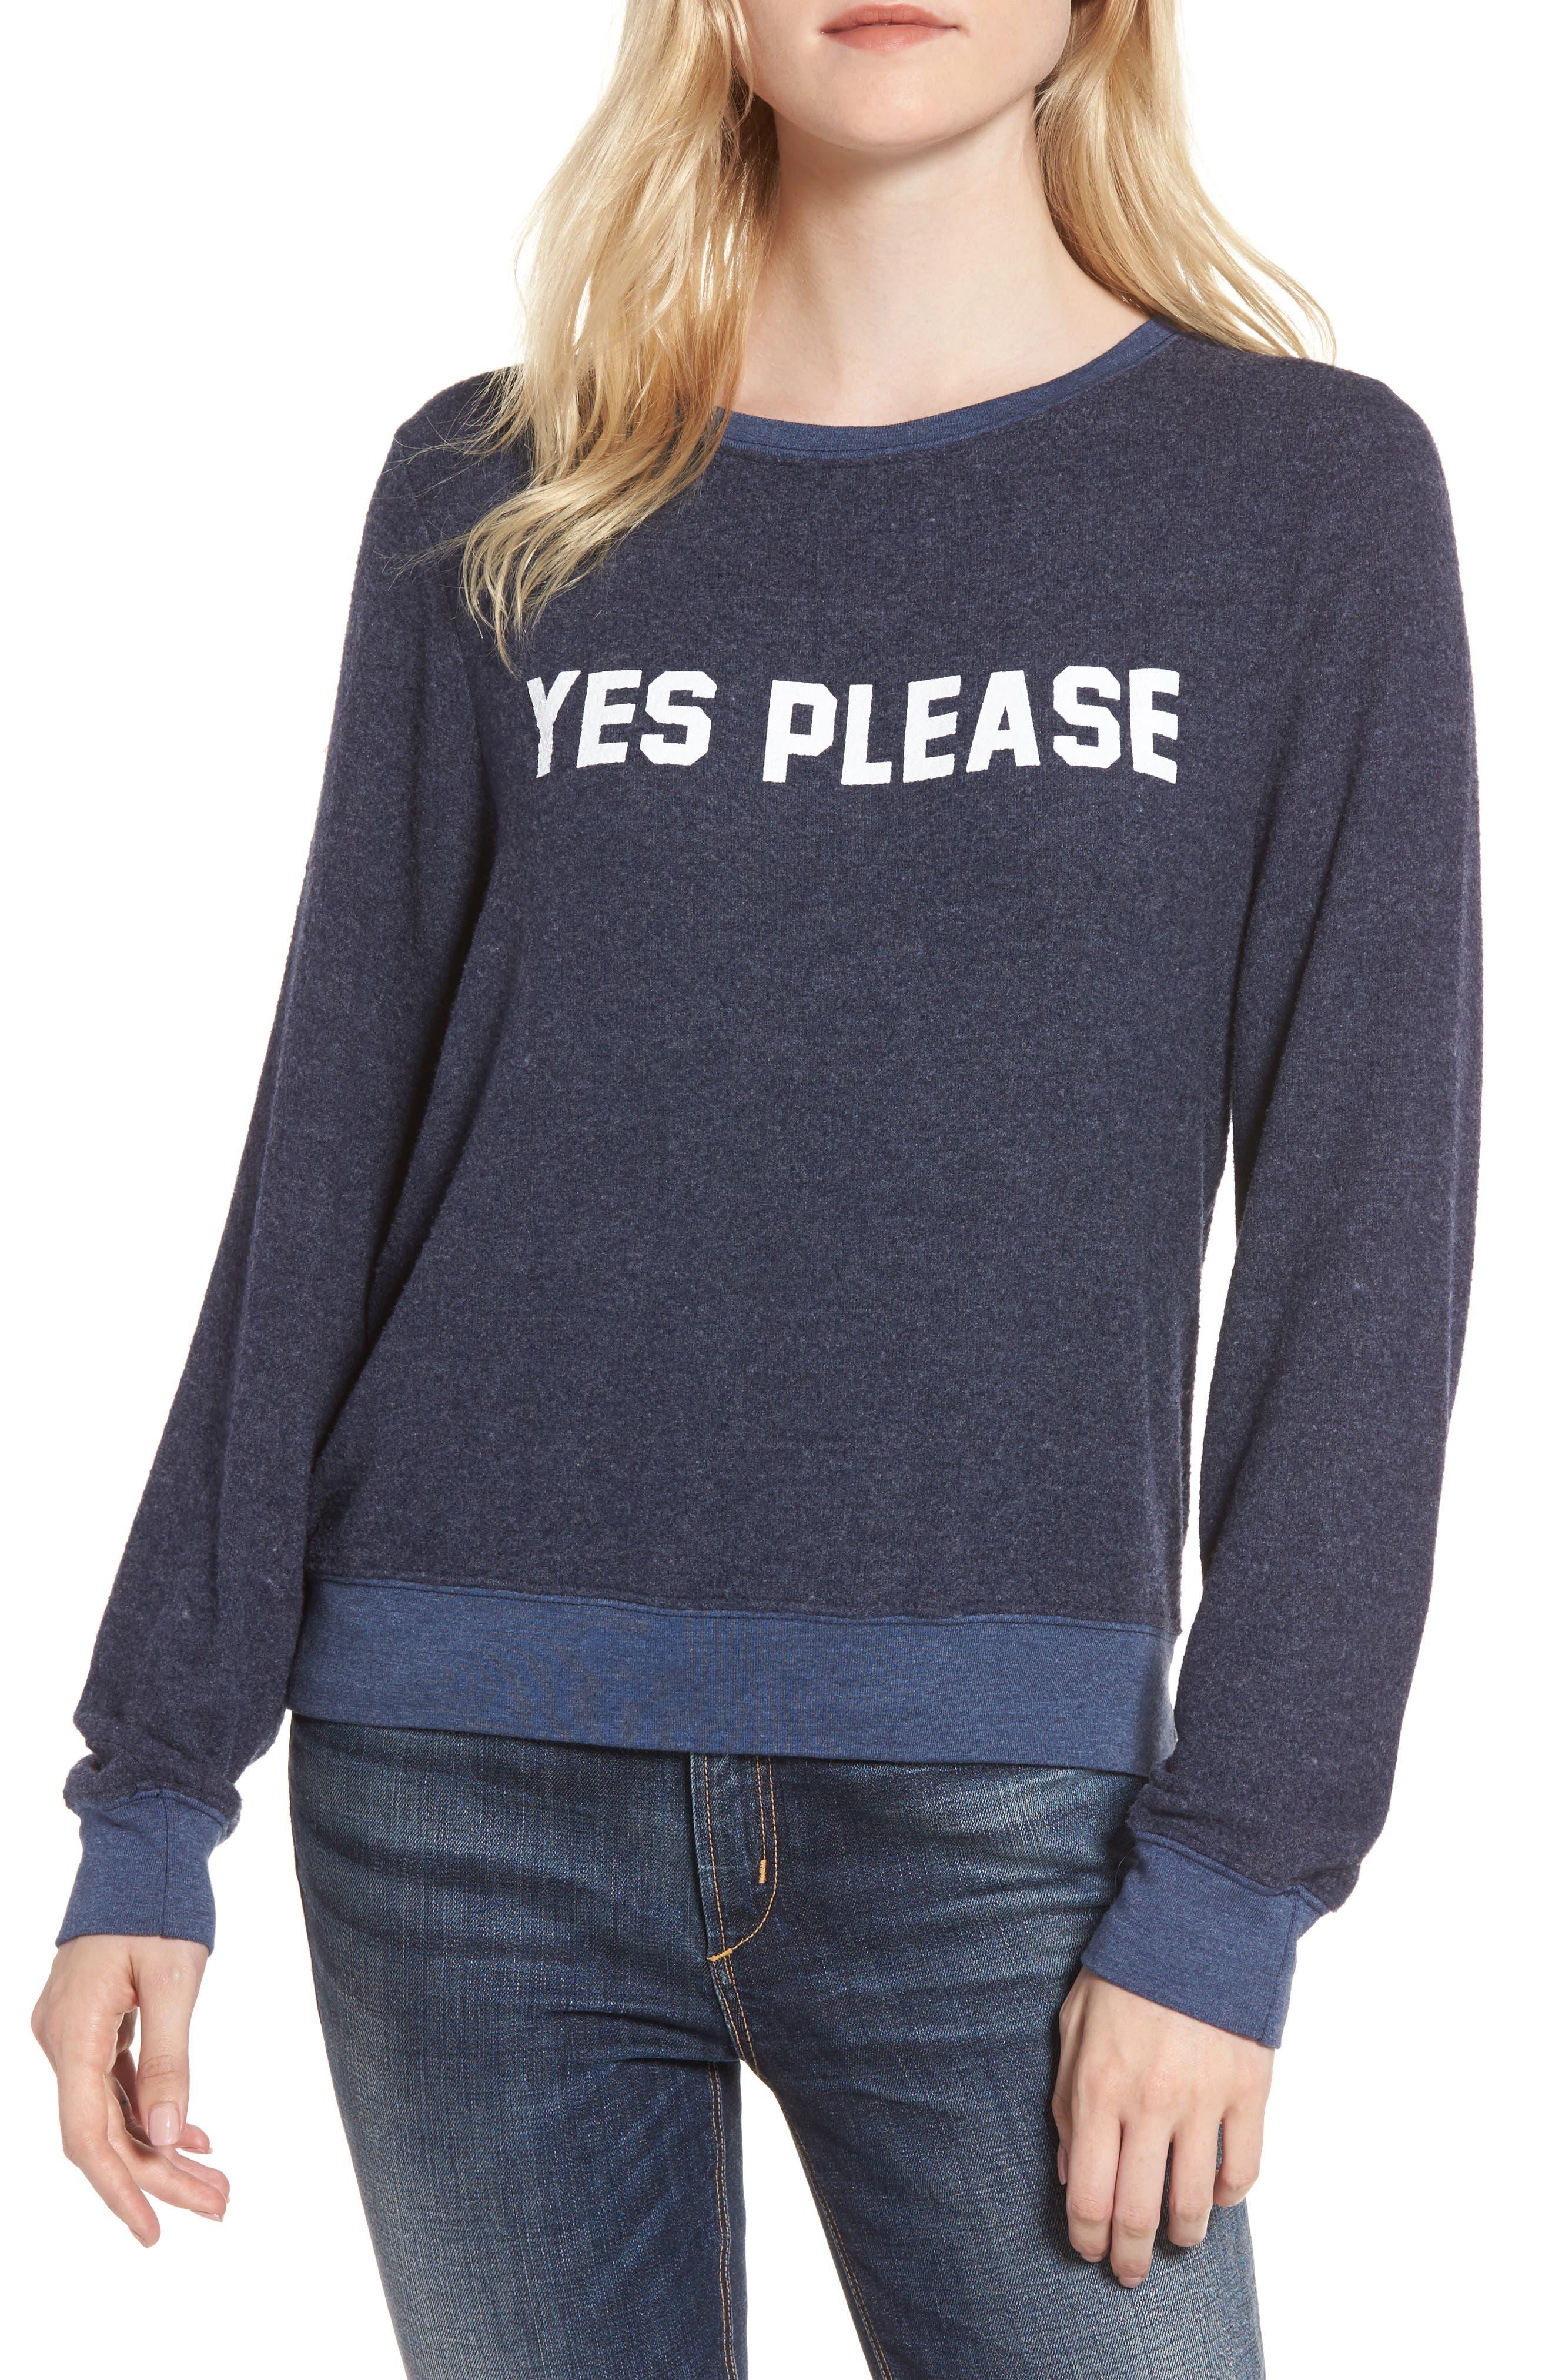 Yes, Please Sweatshirt,                         Main,                         color, Dark Blue